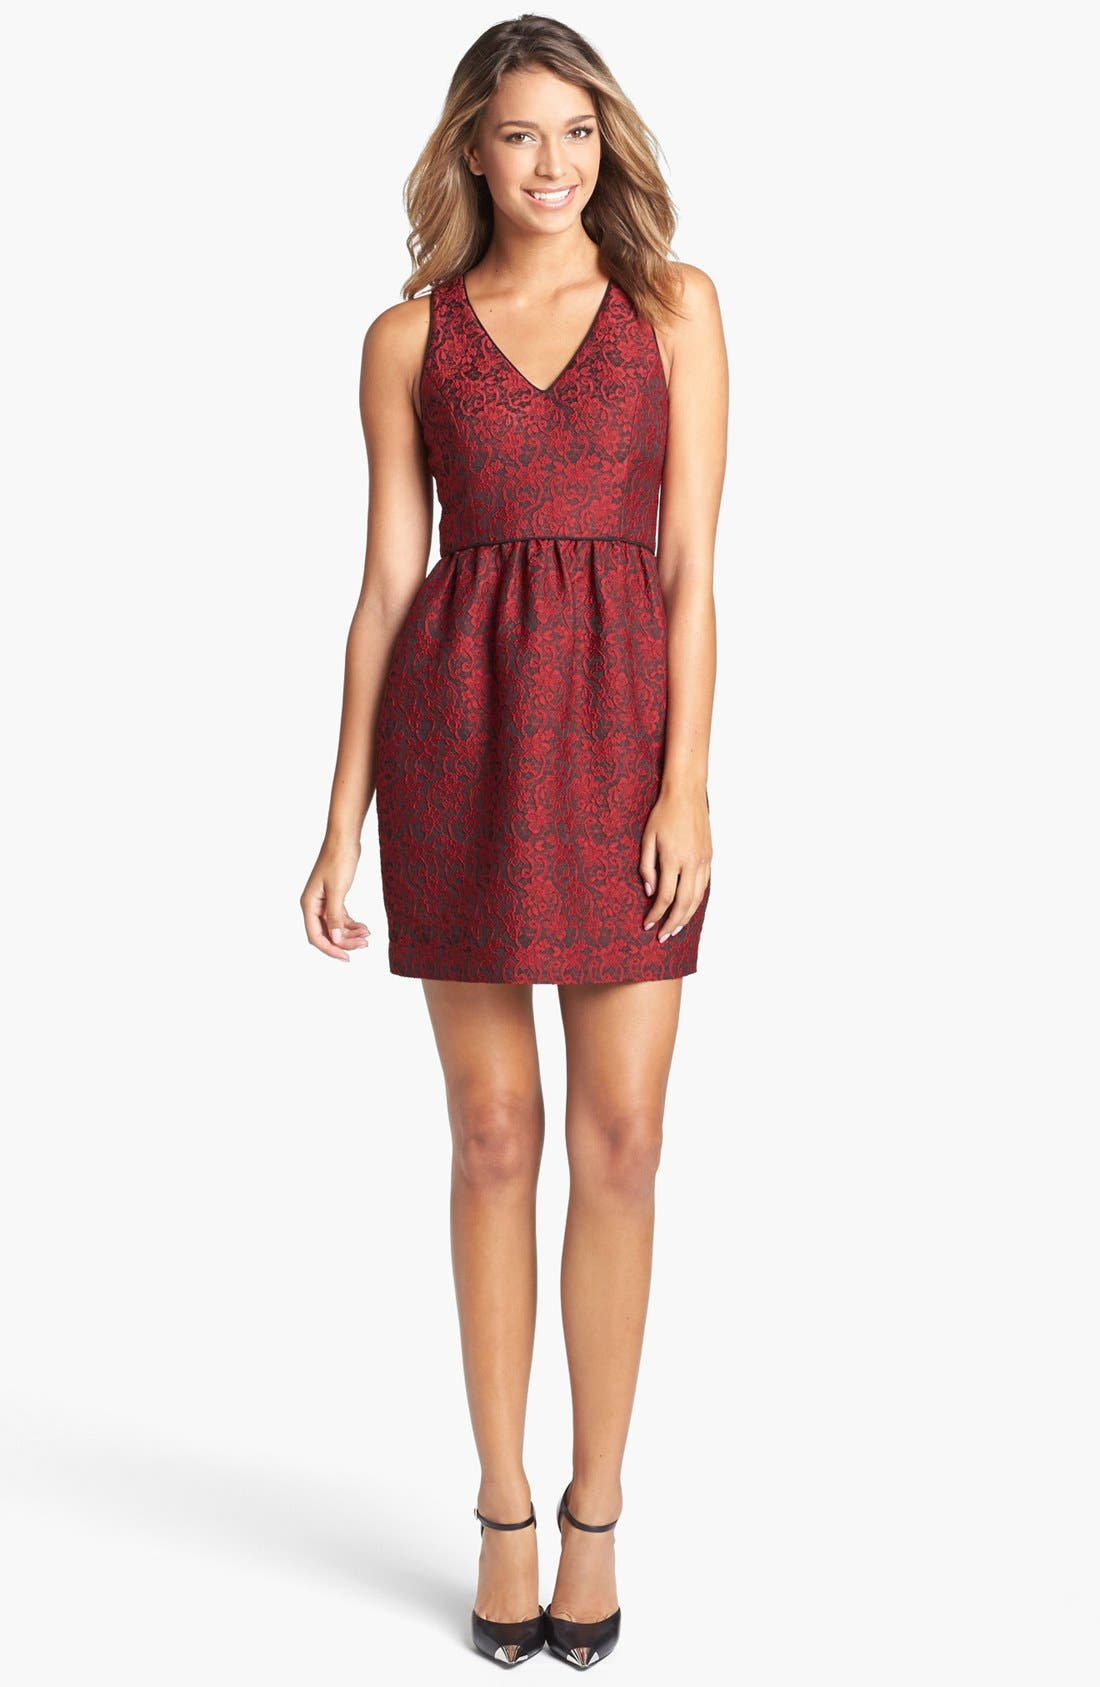 Alternate Image 1 Selected - 4.collective Lace Appliqué Sheath Dress